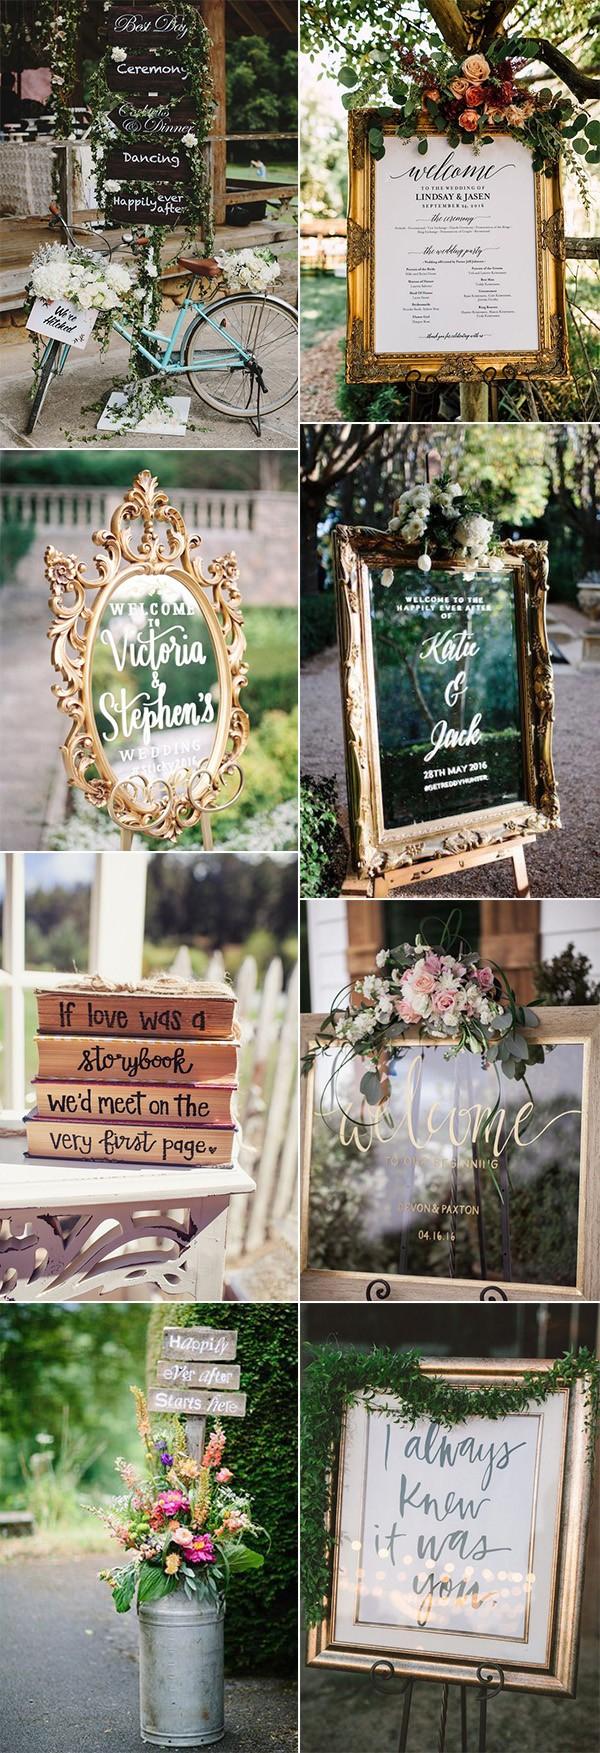 Vintage Wedding Ideas 60 Adorable Vintage Wedding Ideas For 2018 Trends Emmalovesweddings